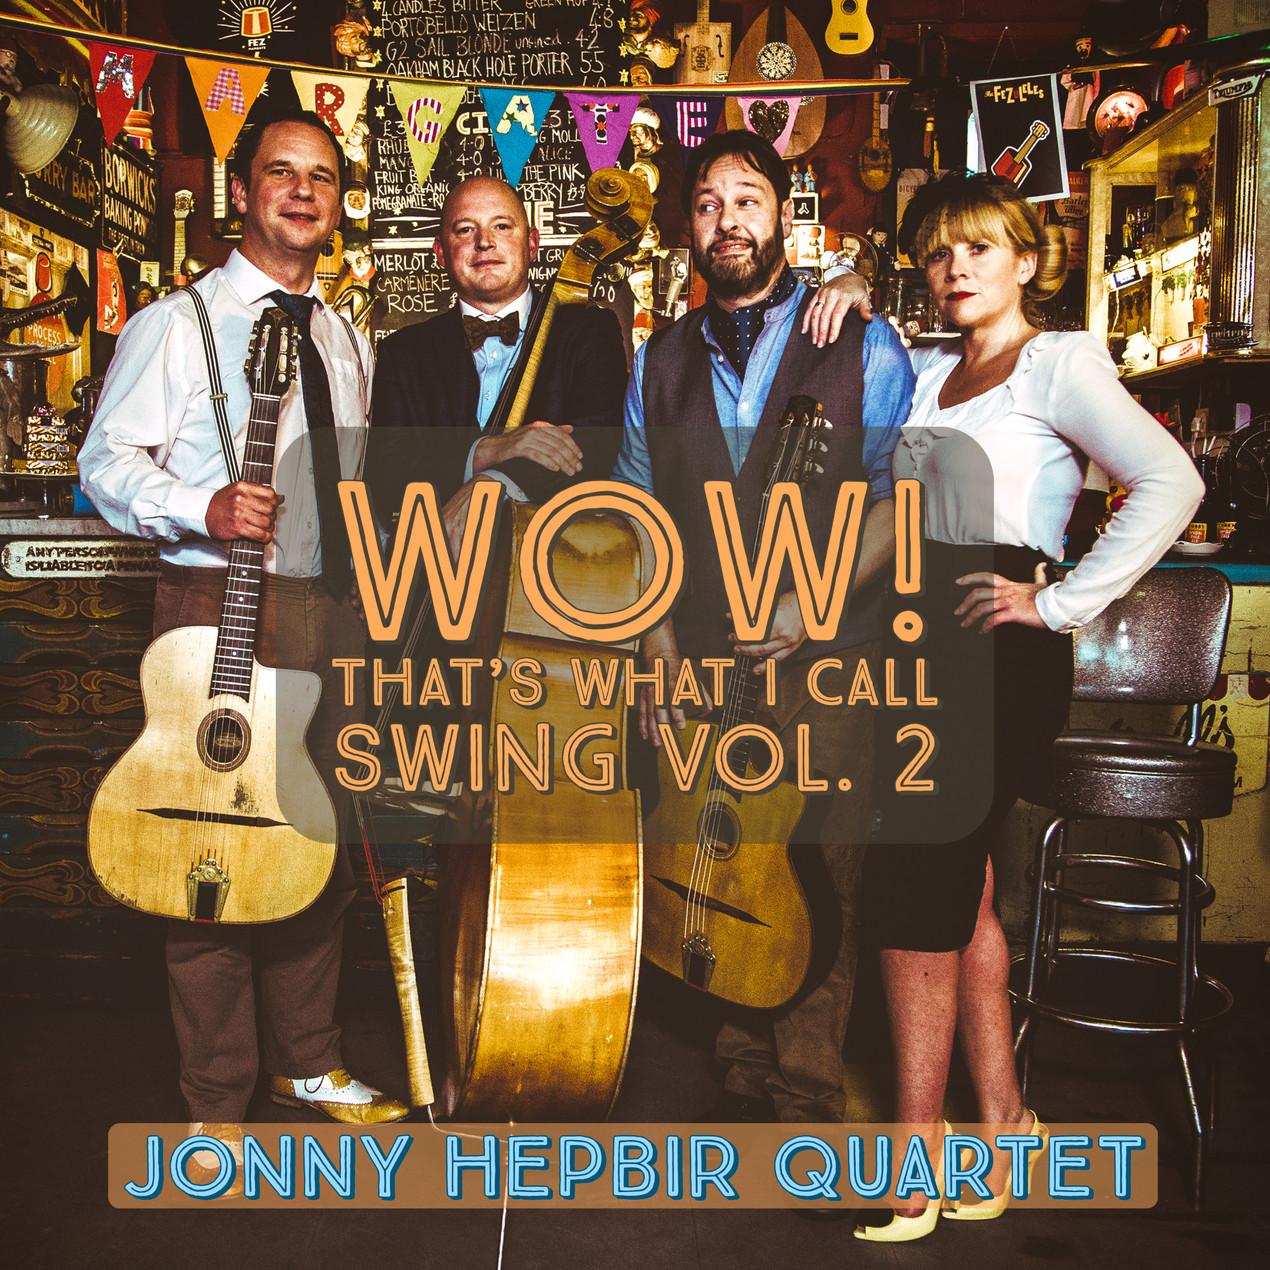 Jonny Hepbir Quartet 'Wow! That's What I Call Swing Vol 2'